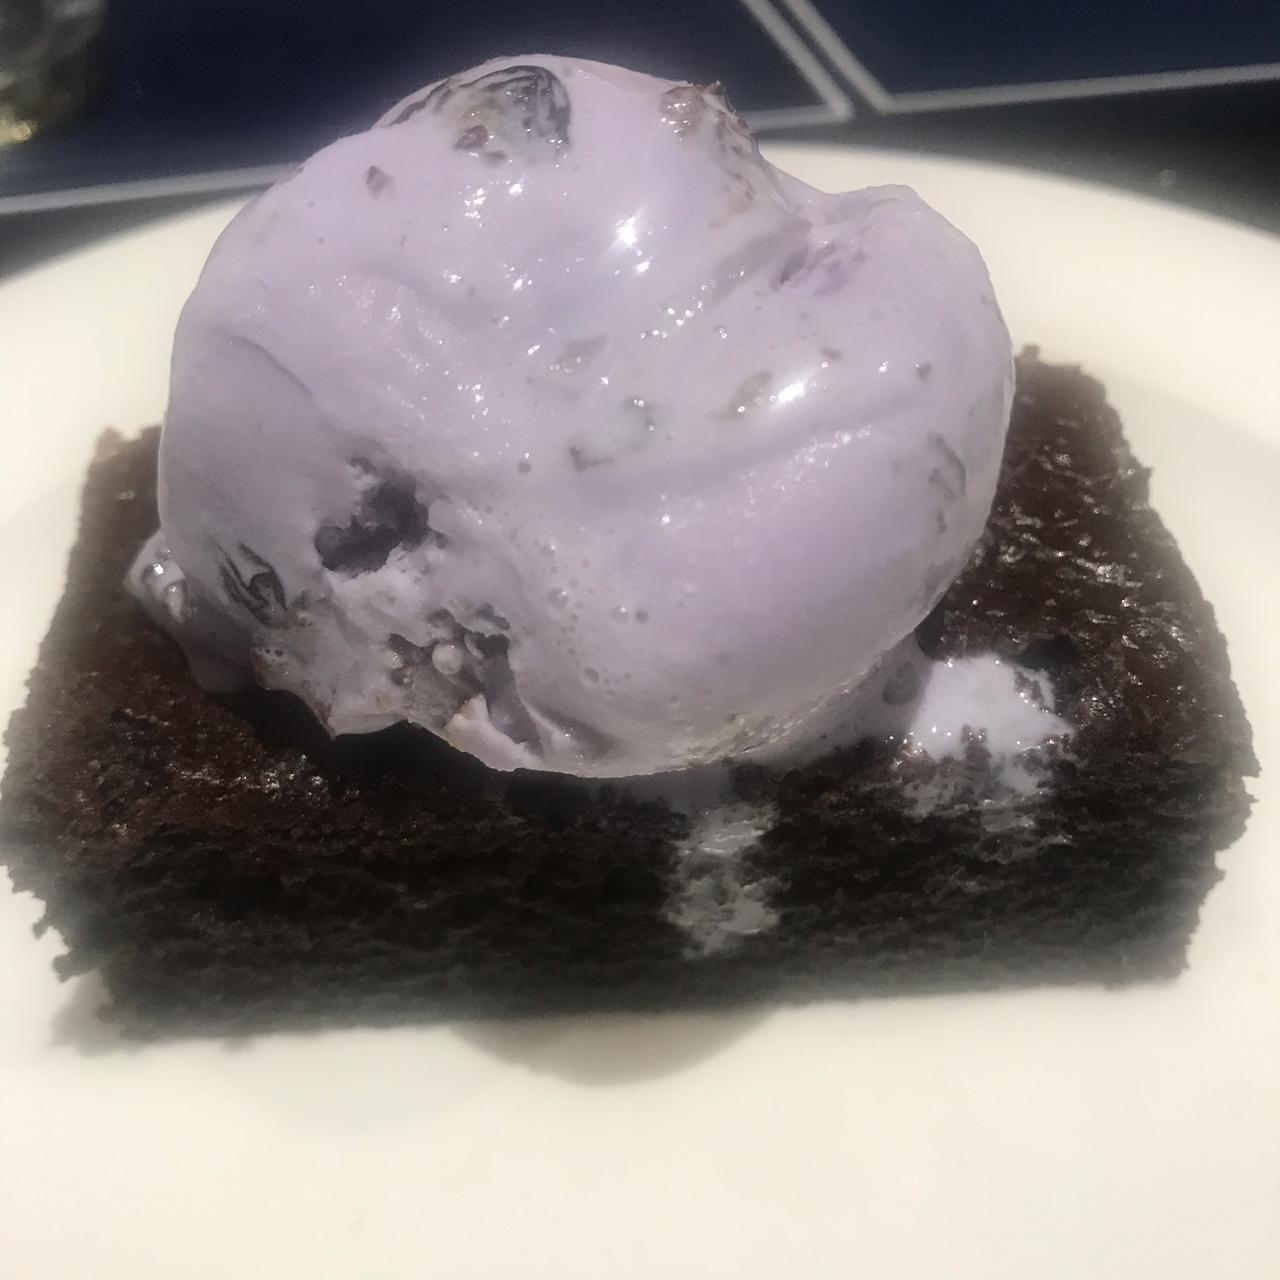 Black Current Ice-Cream on Chocolate Brownie